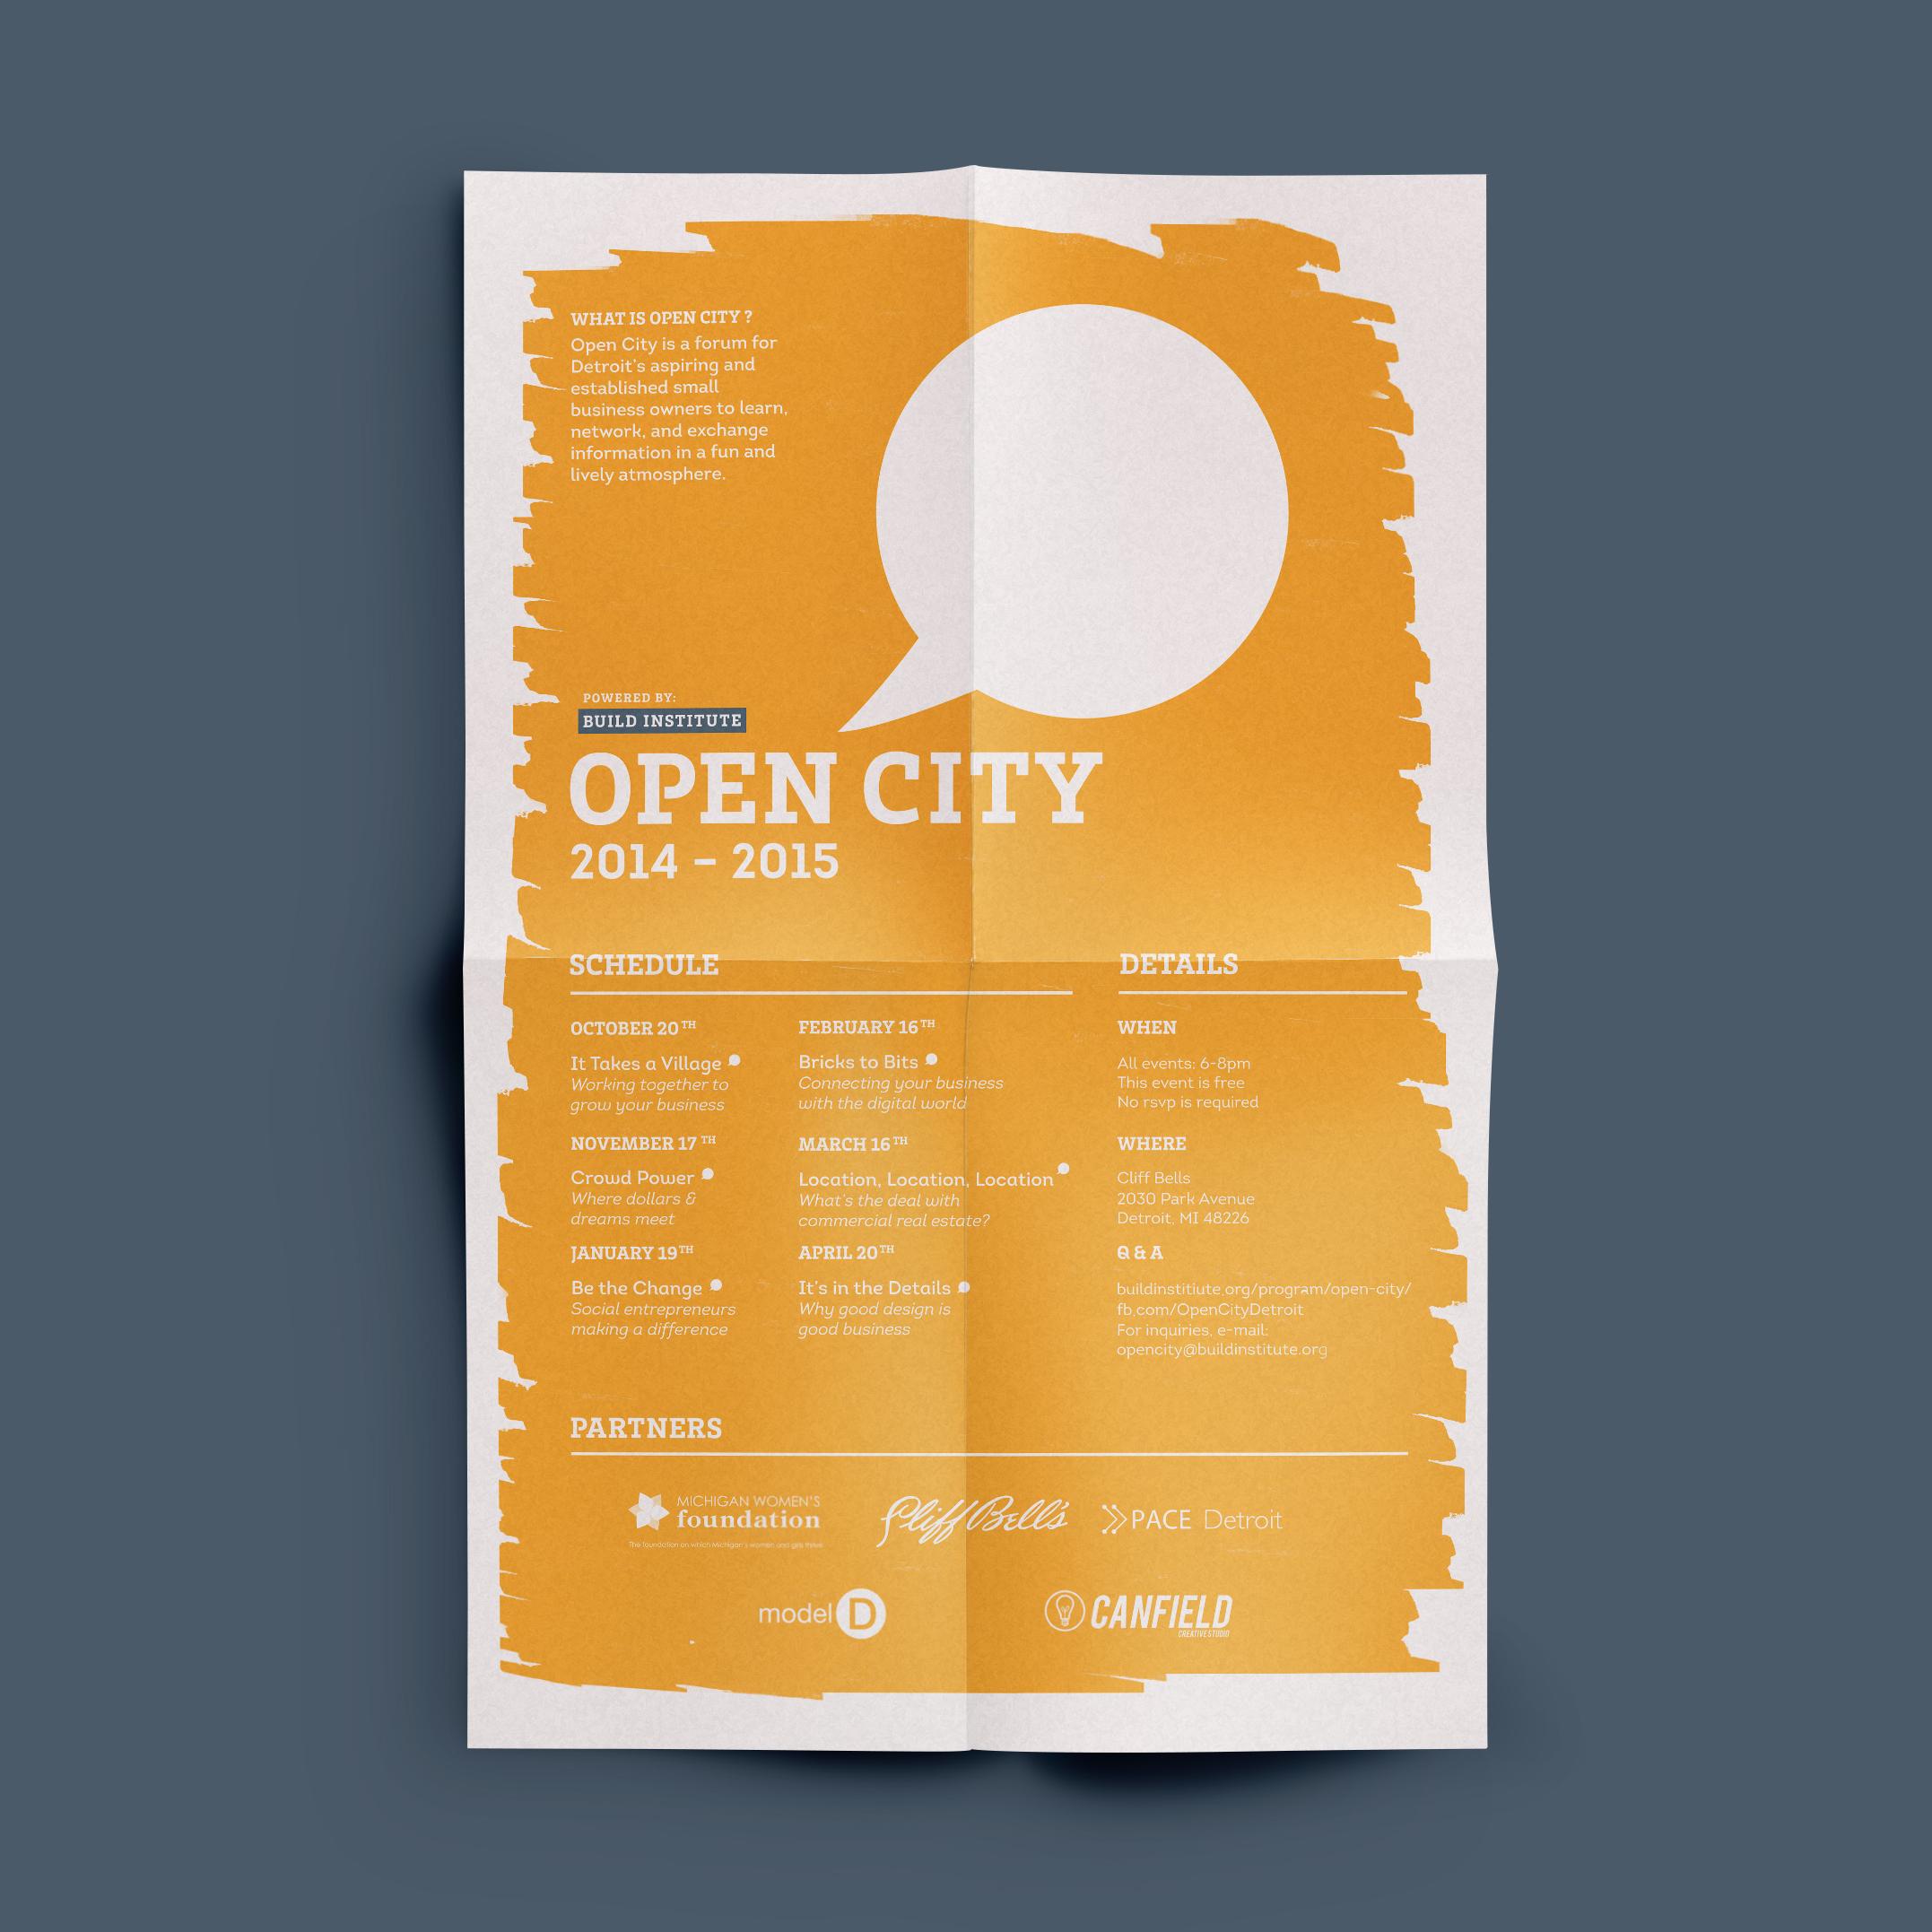 OpenCity_Poster.jpg